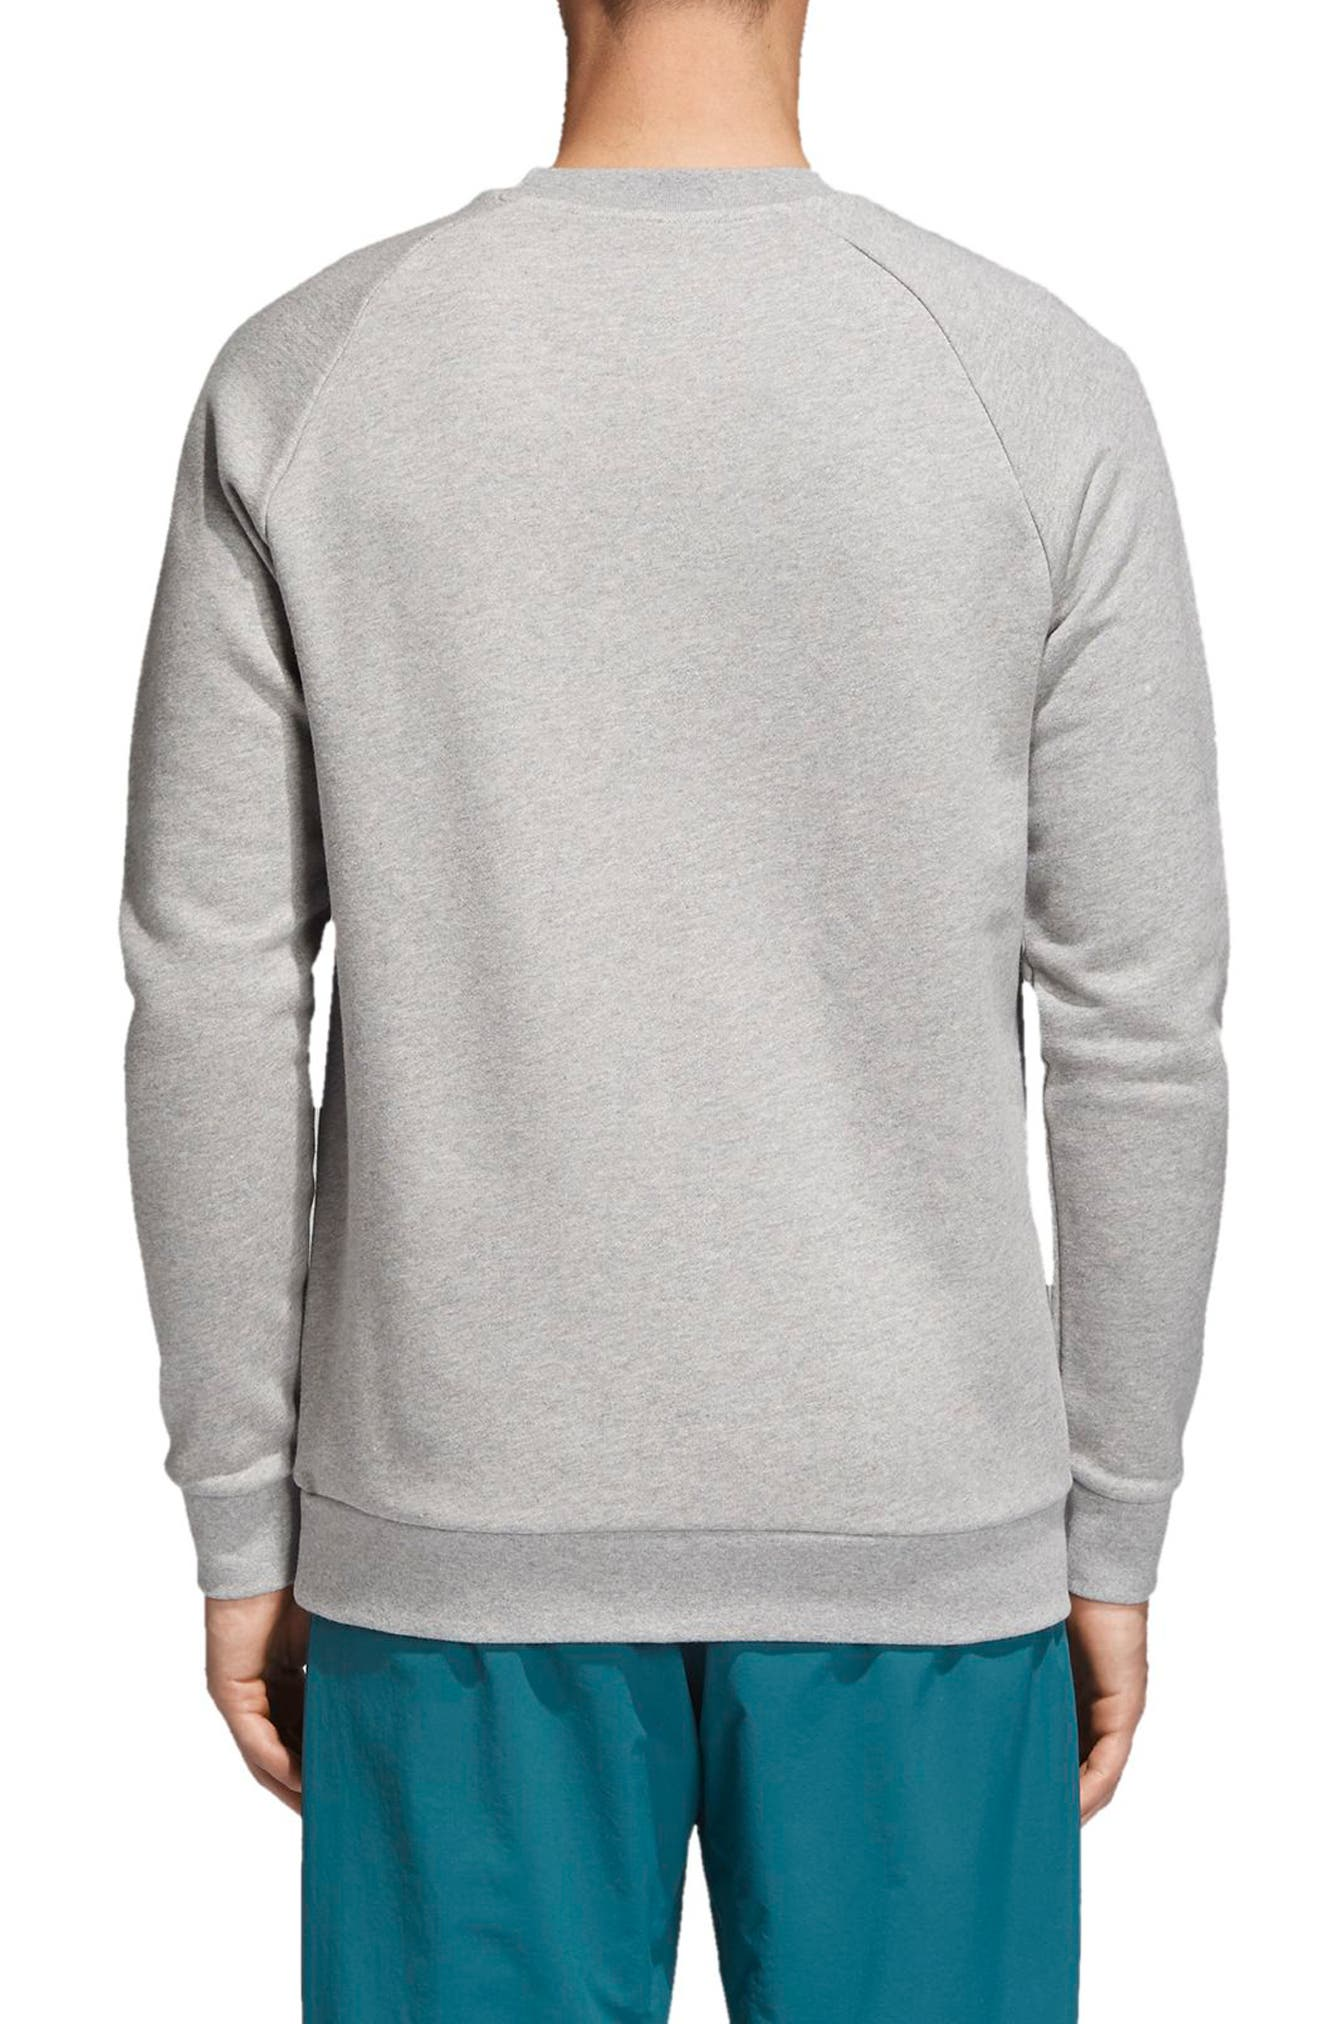 ADIDAS ORIGINALS, adidas Trefoil Crewneck Sweatshirt, Alternate thumbnail 2, color, MEDIUM GREY HEATHER